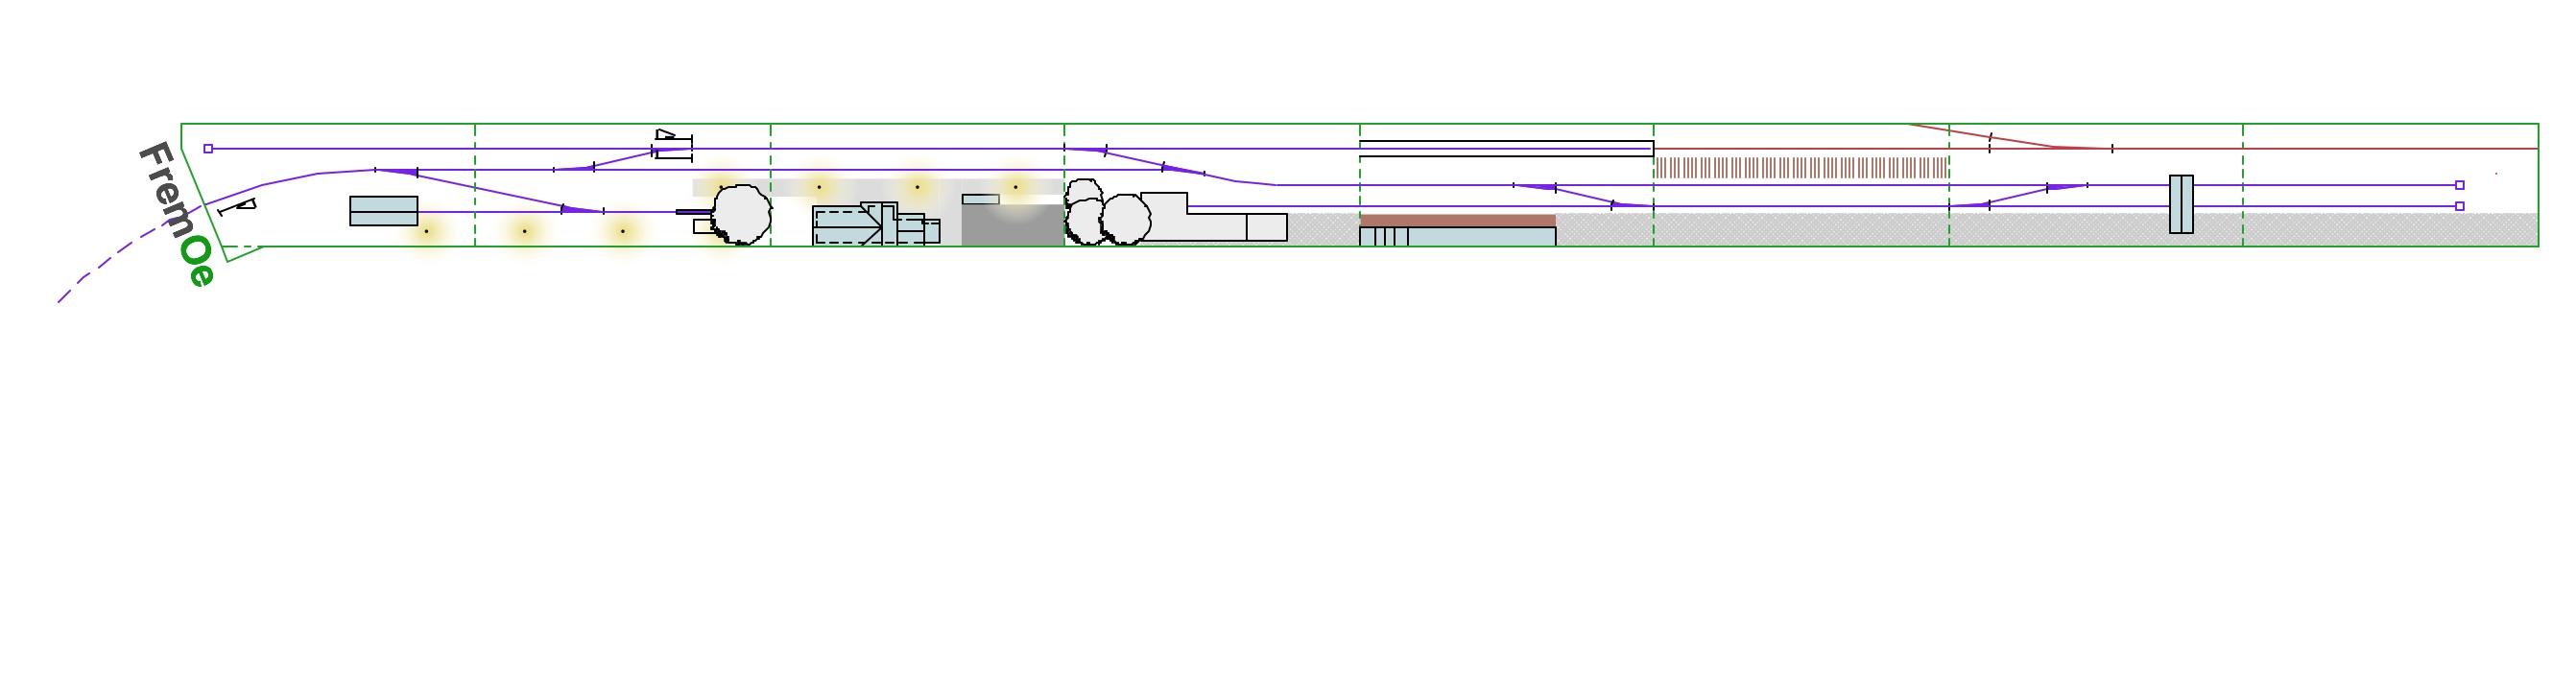 Stacja 0e.jpg